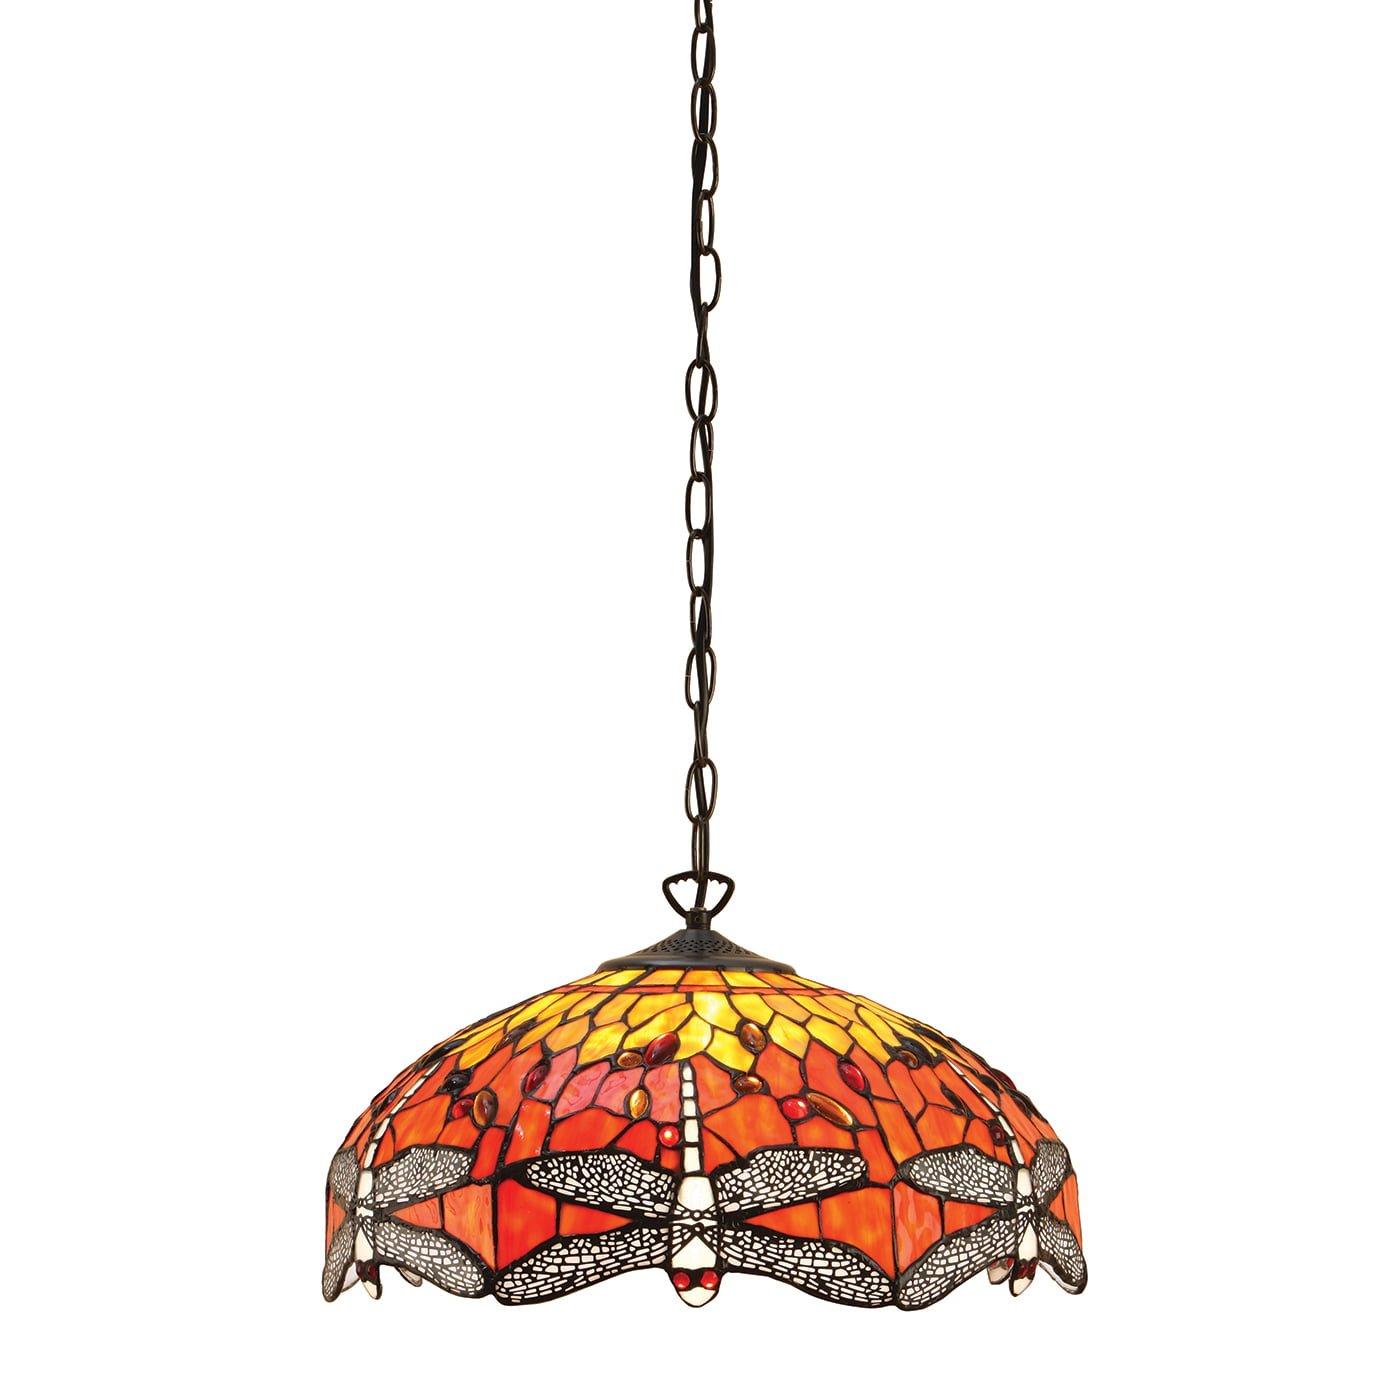 Interiors 1900 64081 Dragonfly flame Medium 3lt pendant, Tiffany